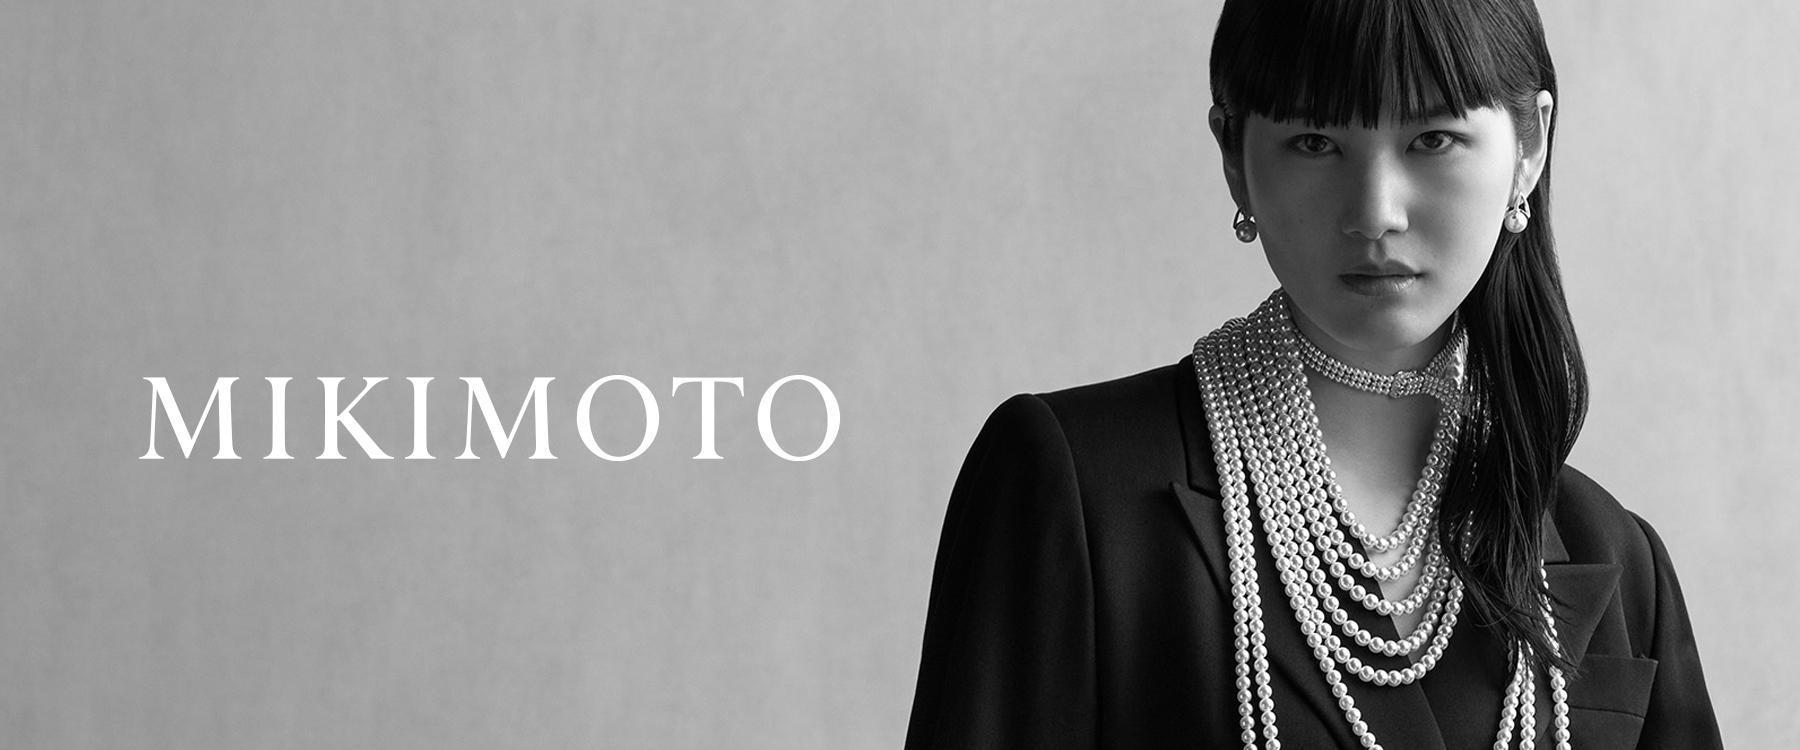 Explore the Mikimoto Collection